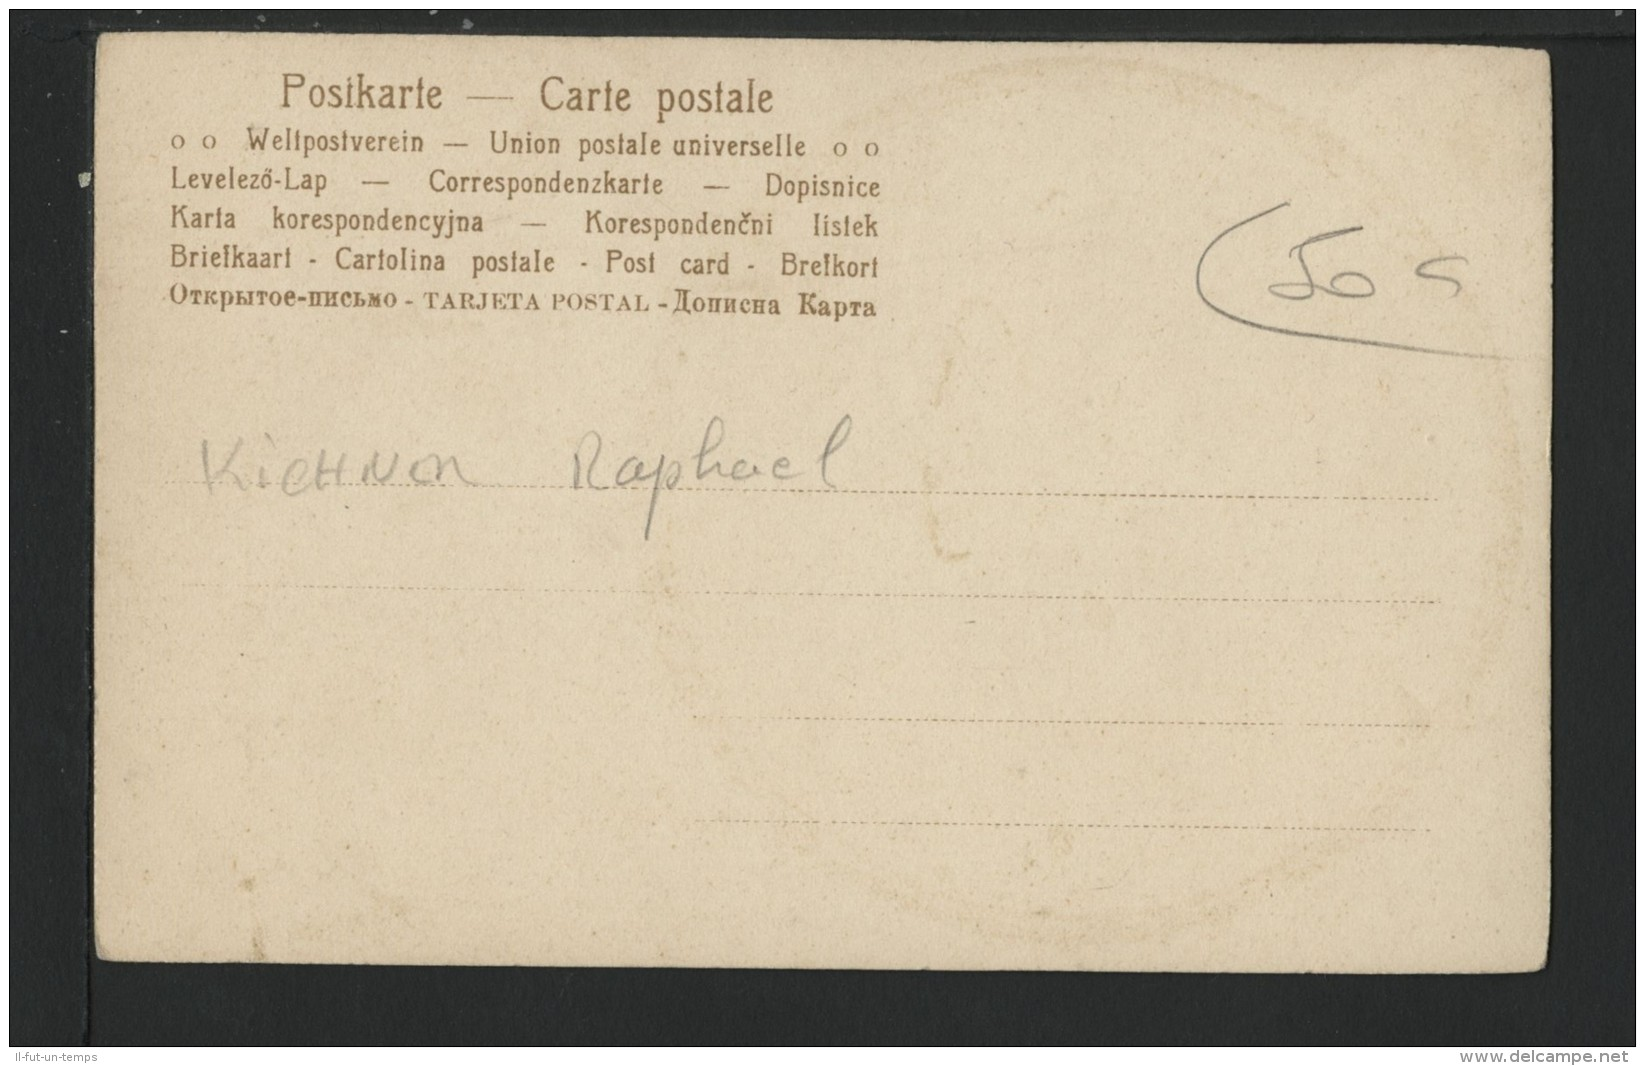 KIRCHNER Raphael - LA JEUNE FEMME ET L'ESCARGOT - Kirchner, Raphael